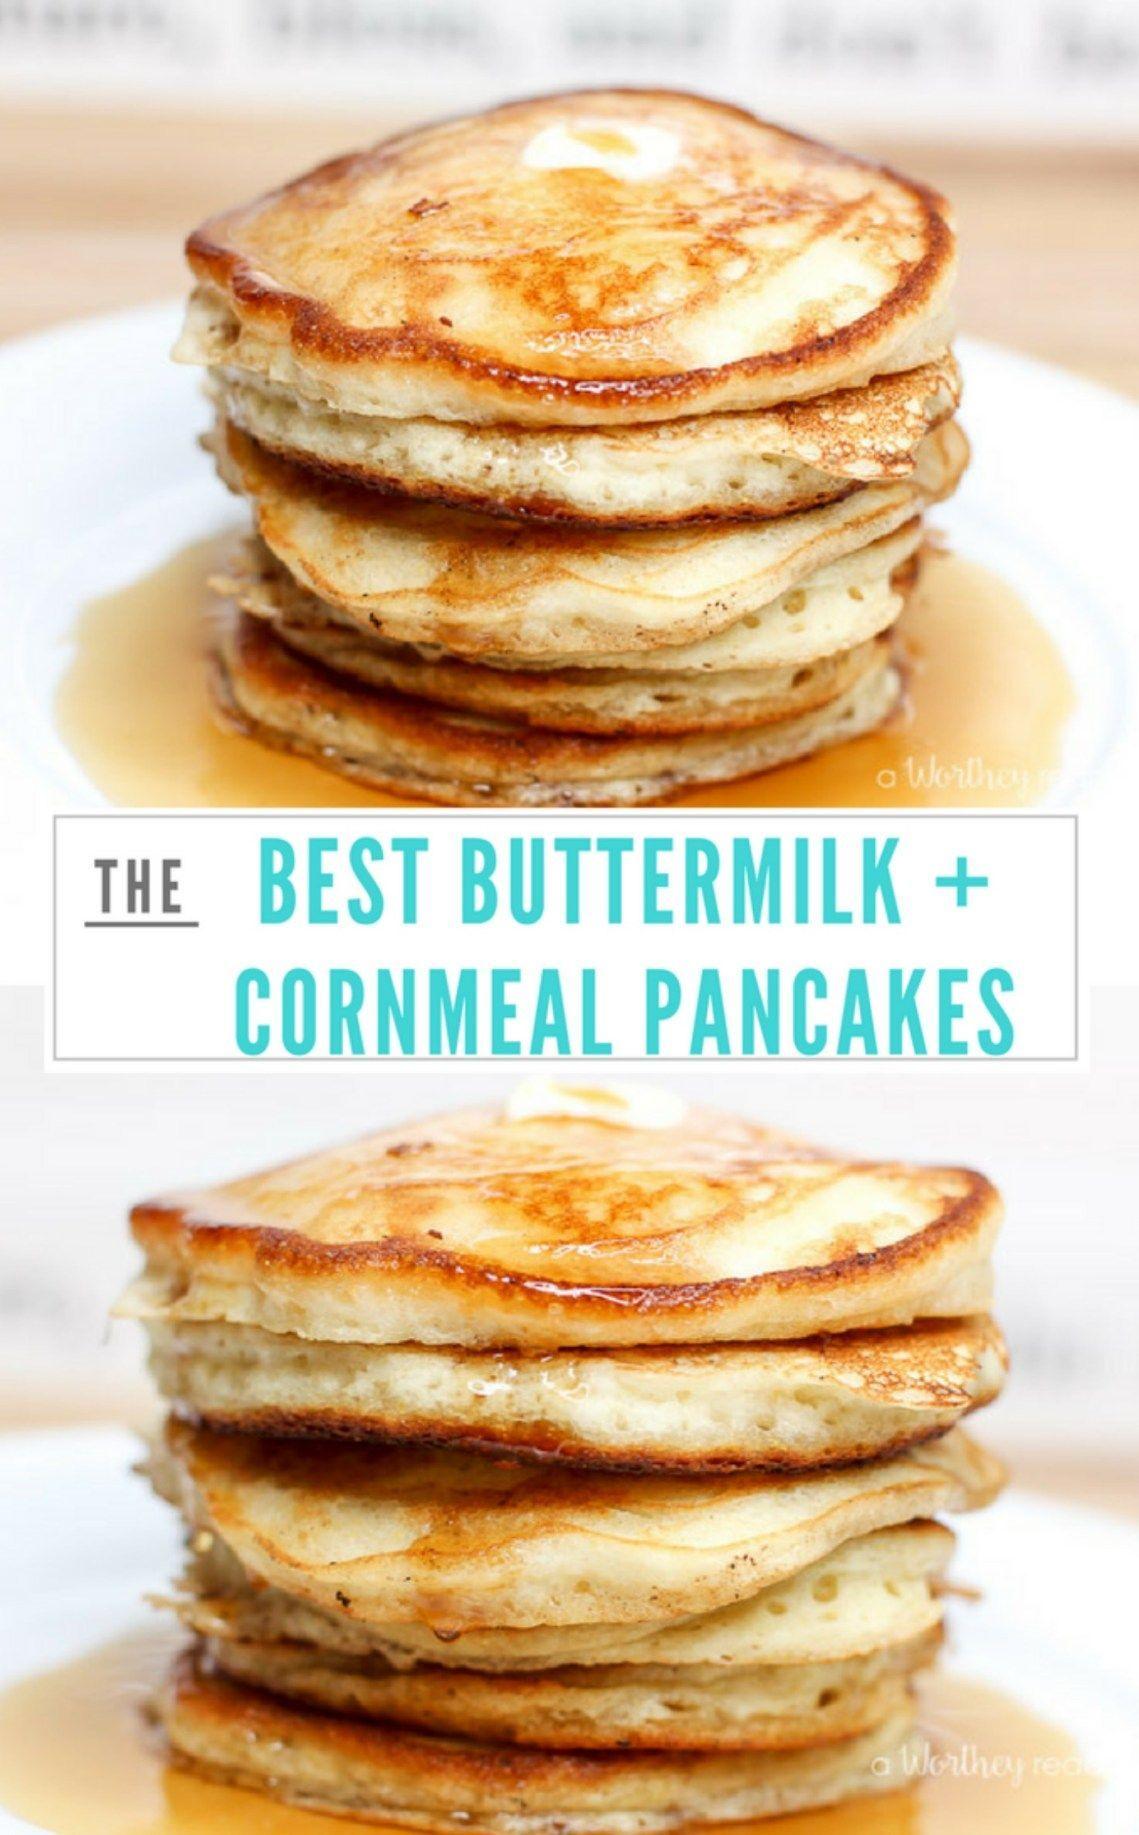 The Best Buttermilk Cornmeal Pancakes In 2020 Cornmeal Pancakes Pancake Recipe Recipes